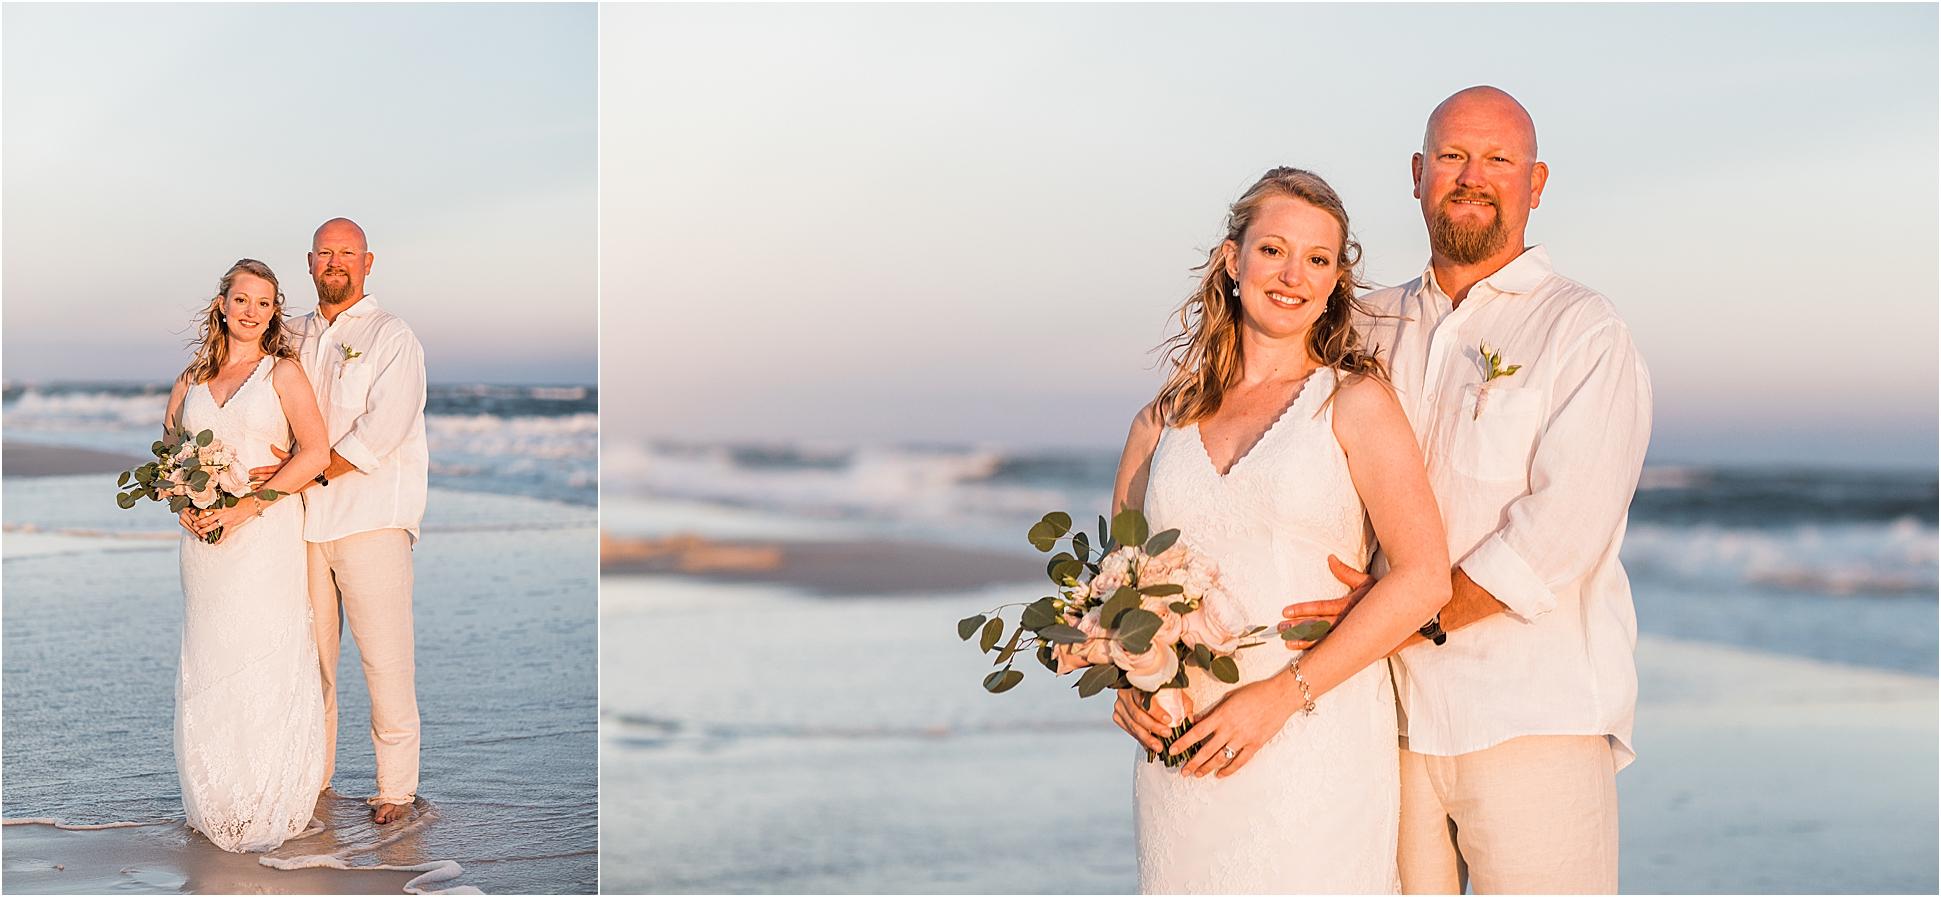 Intimate Beach Weddings